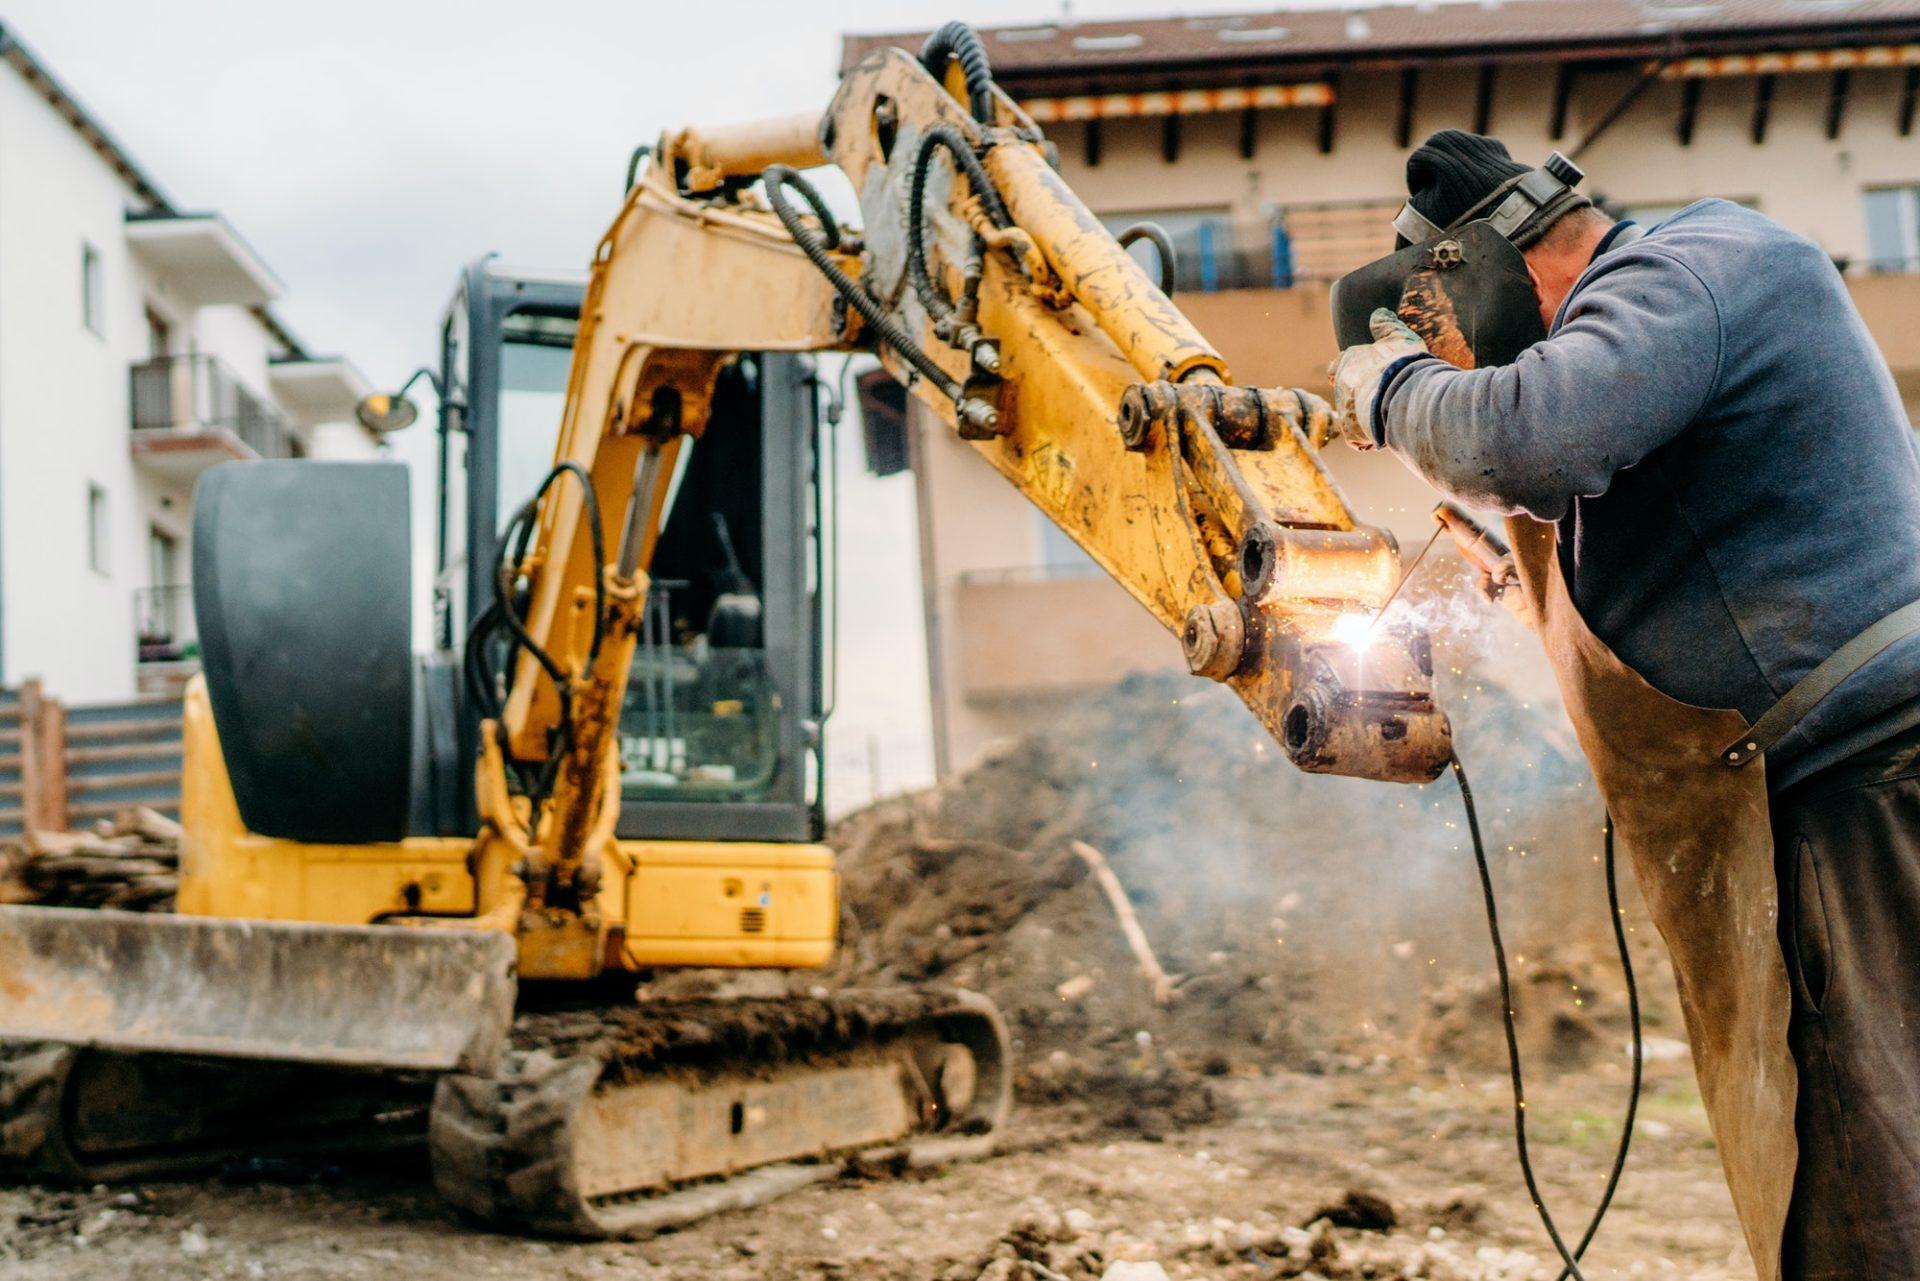 construction and building site, broken excavator and professional welder